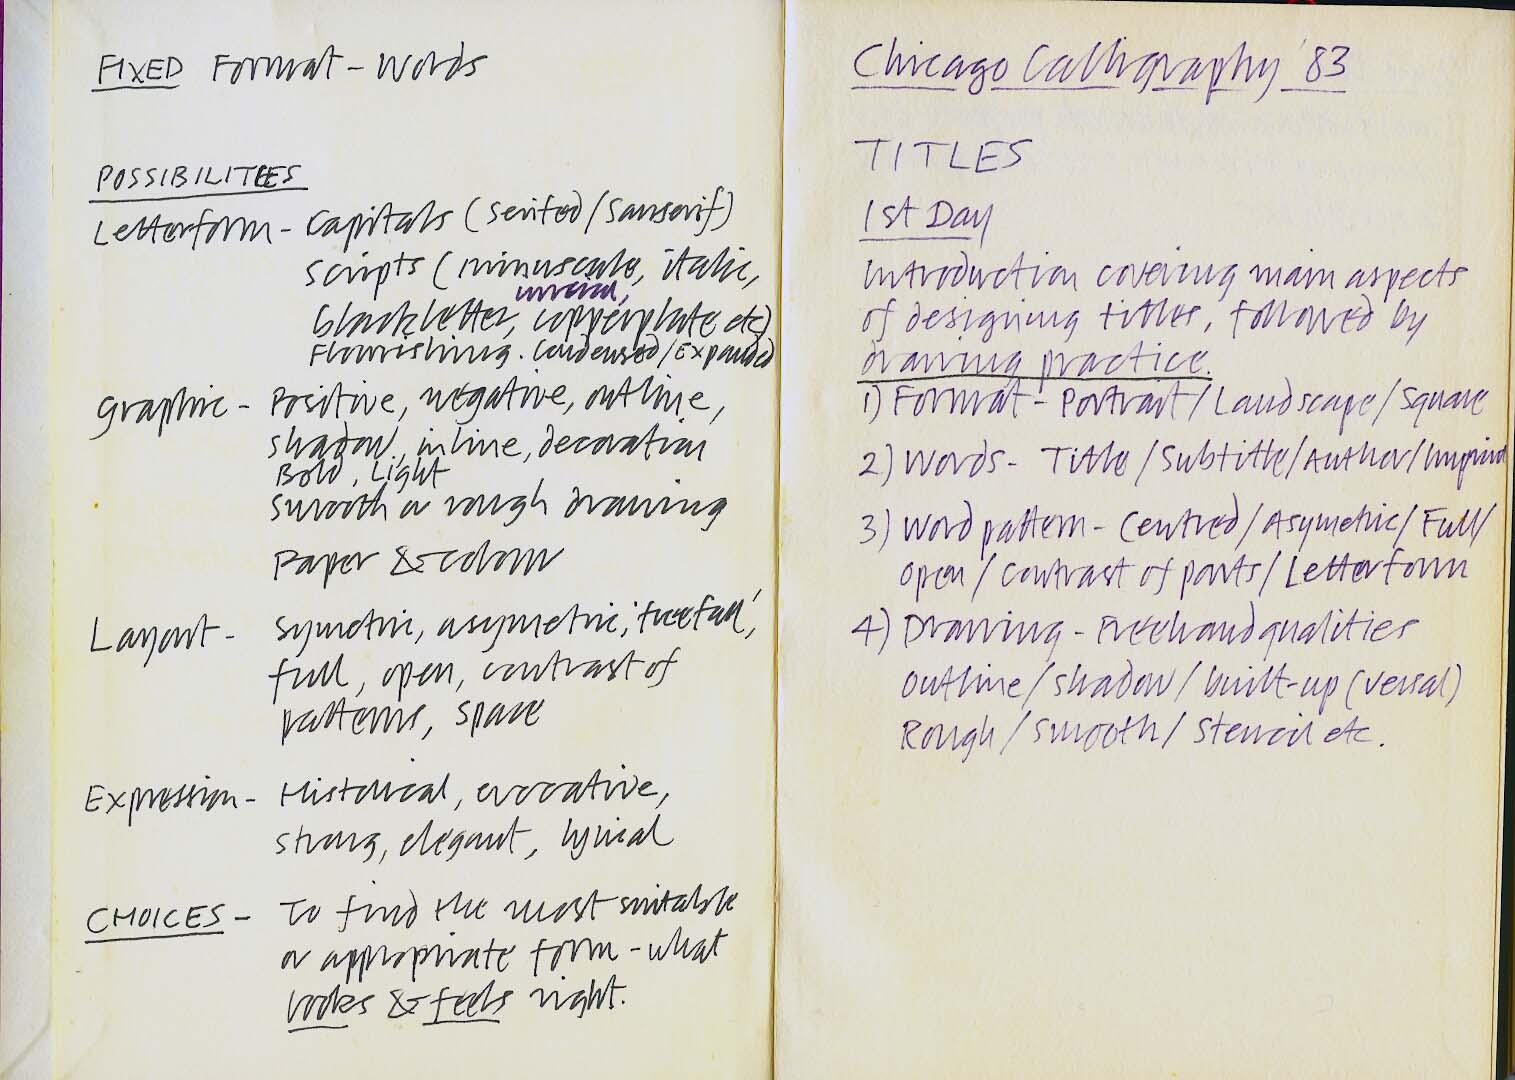 Chicago Calligraphy 1983#1